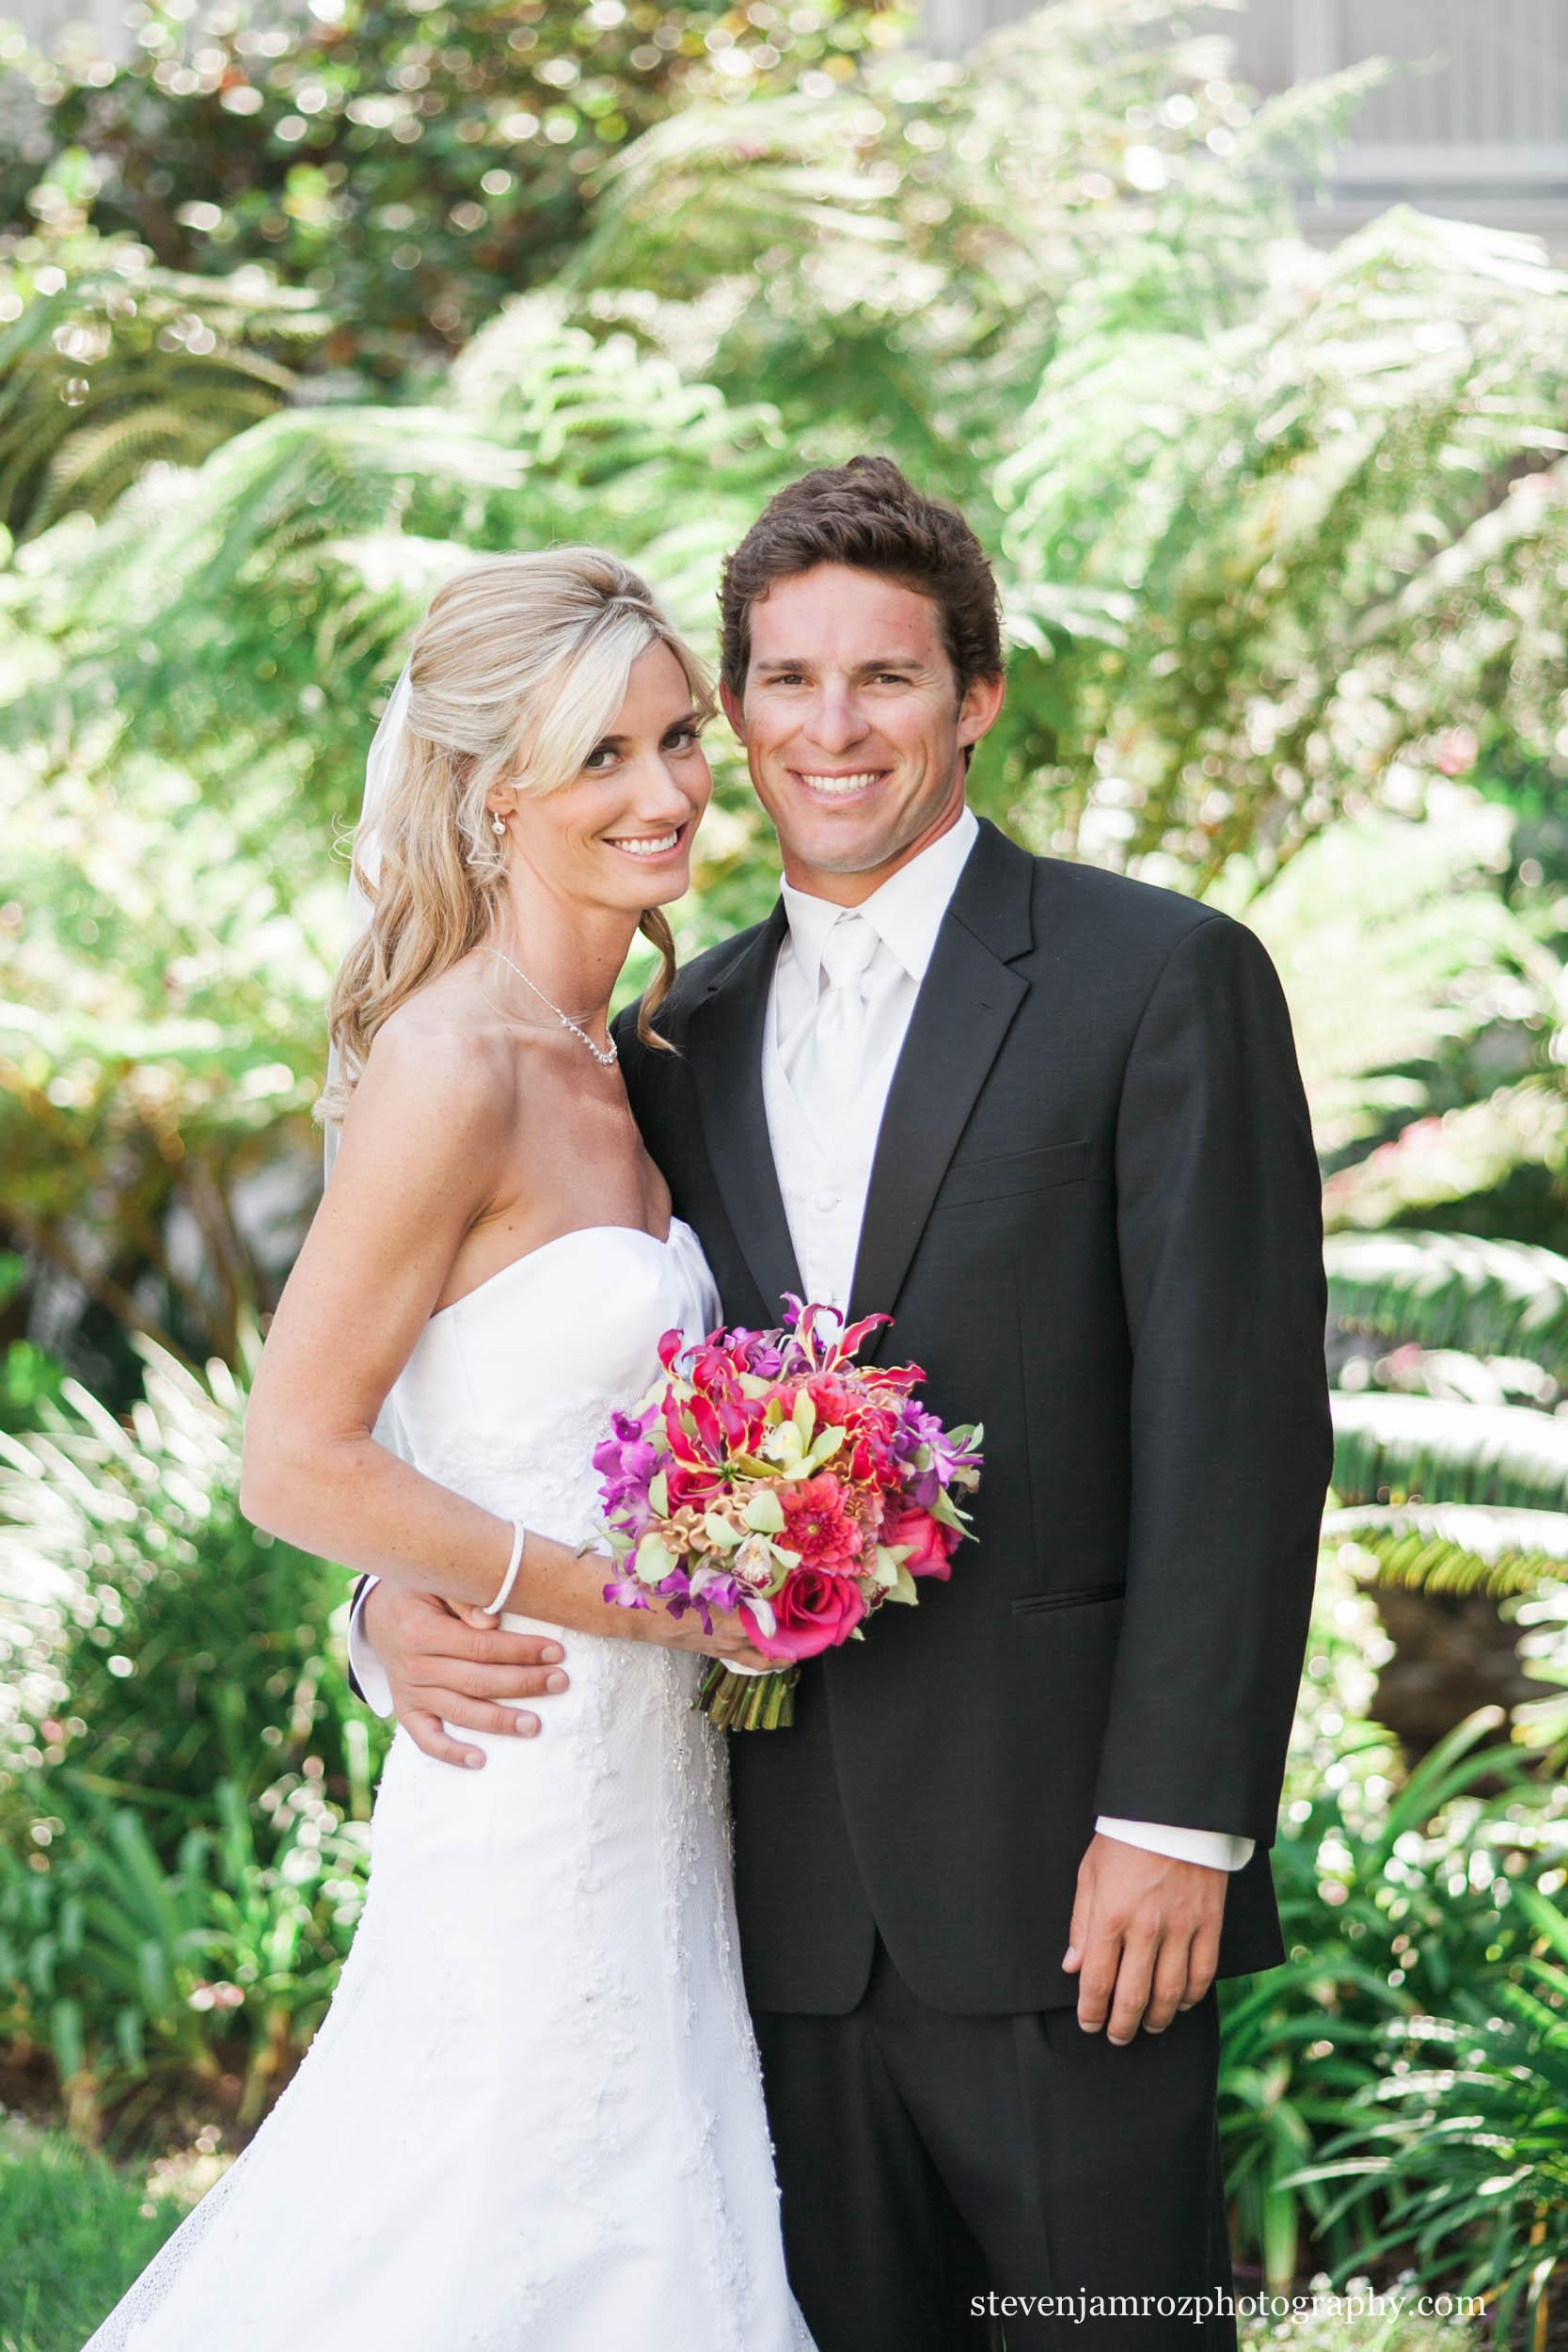 just-married-couple-raleigh-wedding-photographer-steven-jamroz-photography-0005.jpg